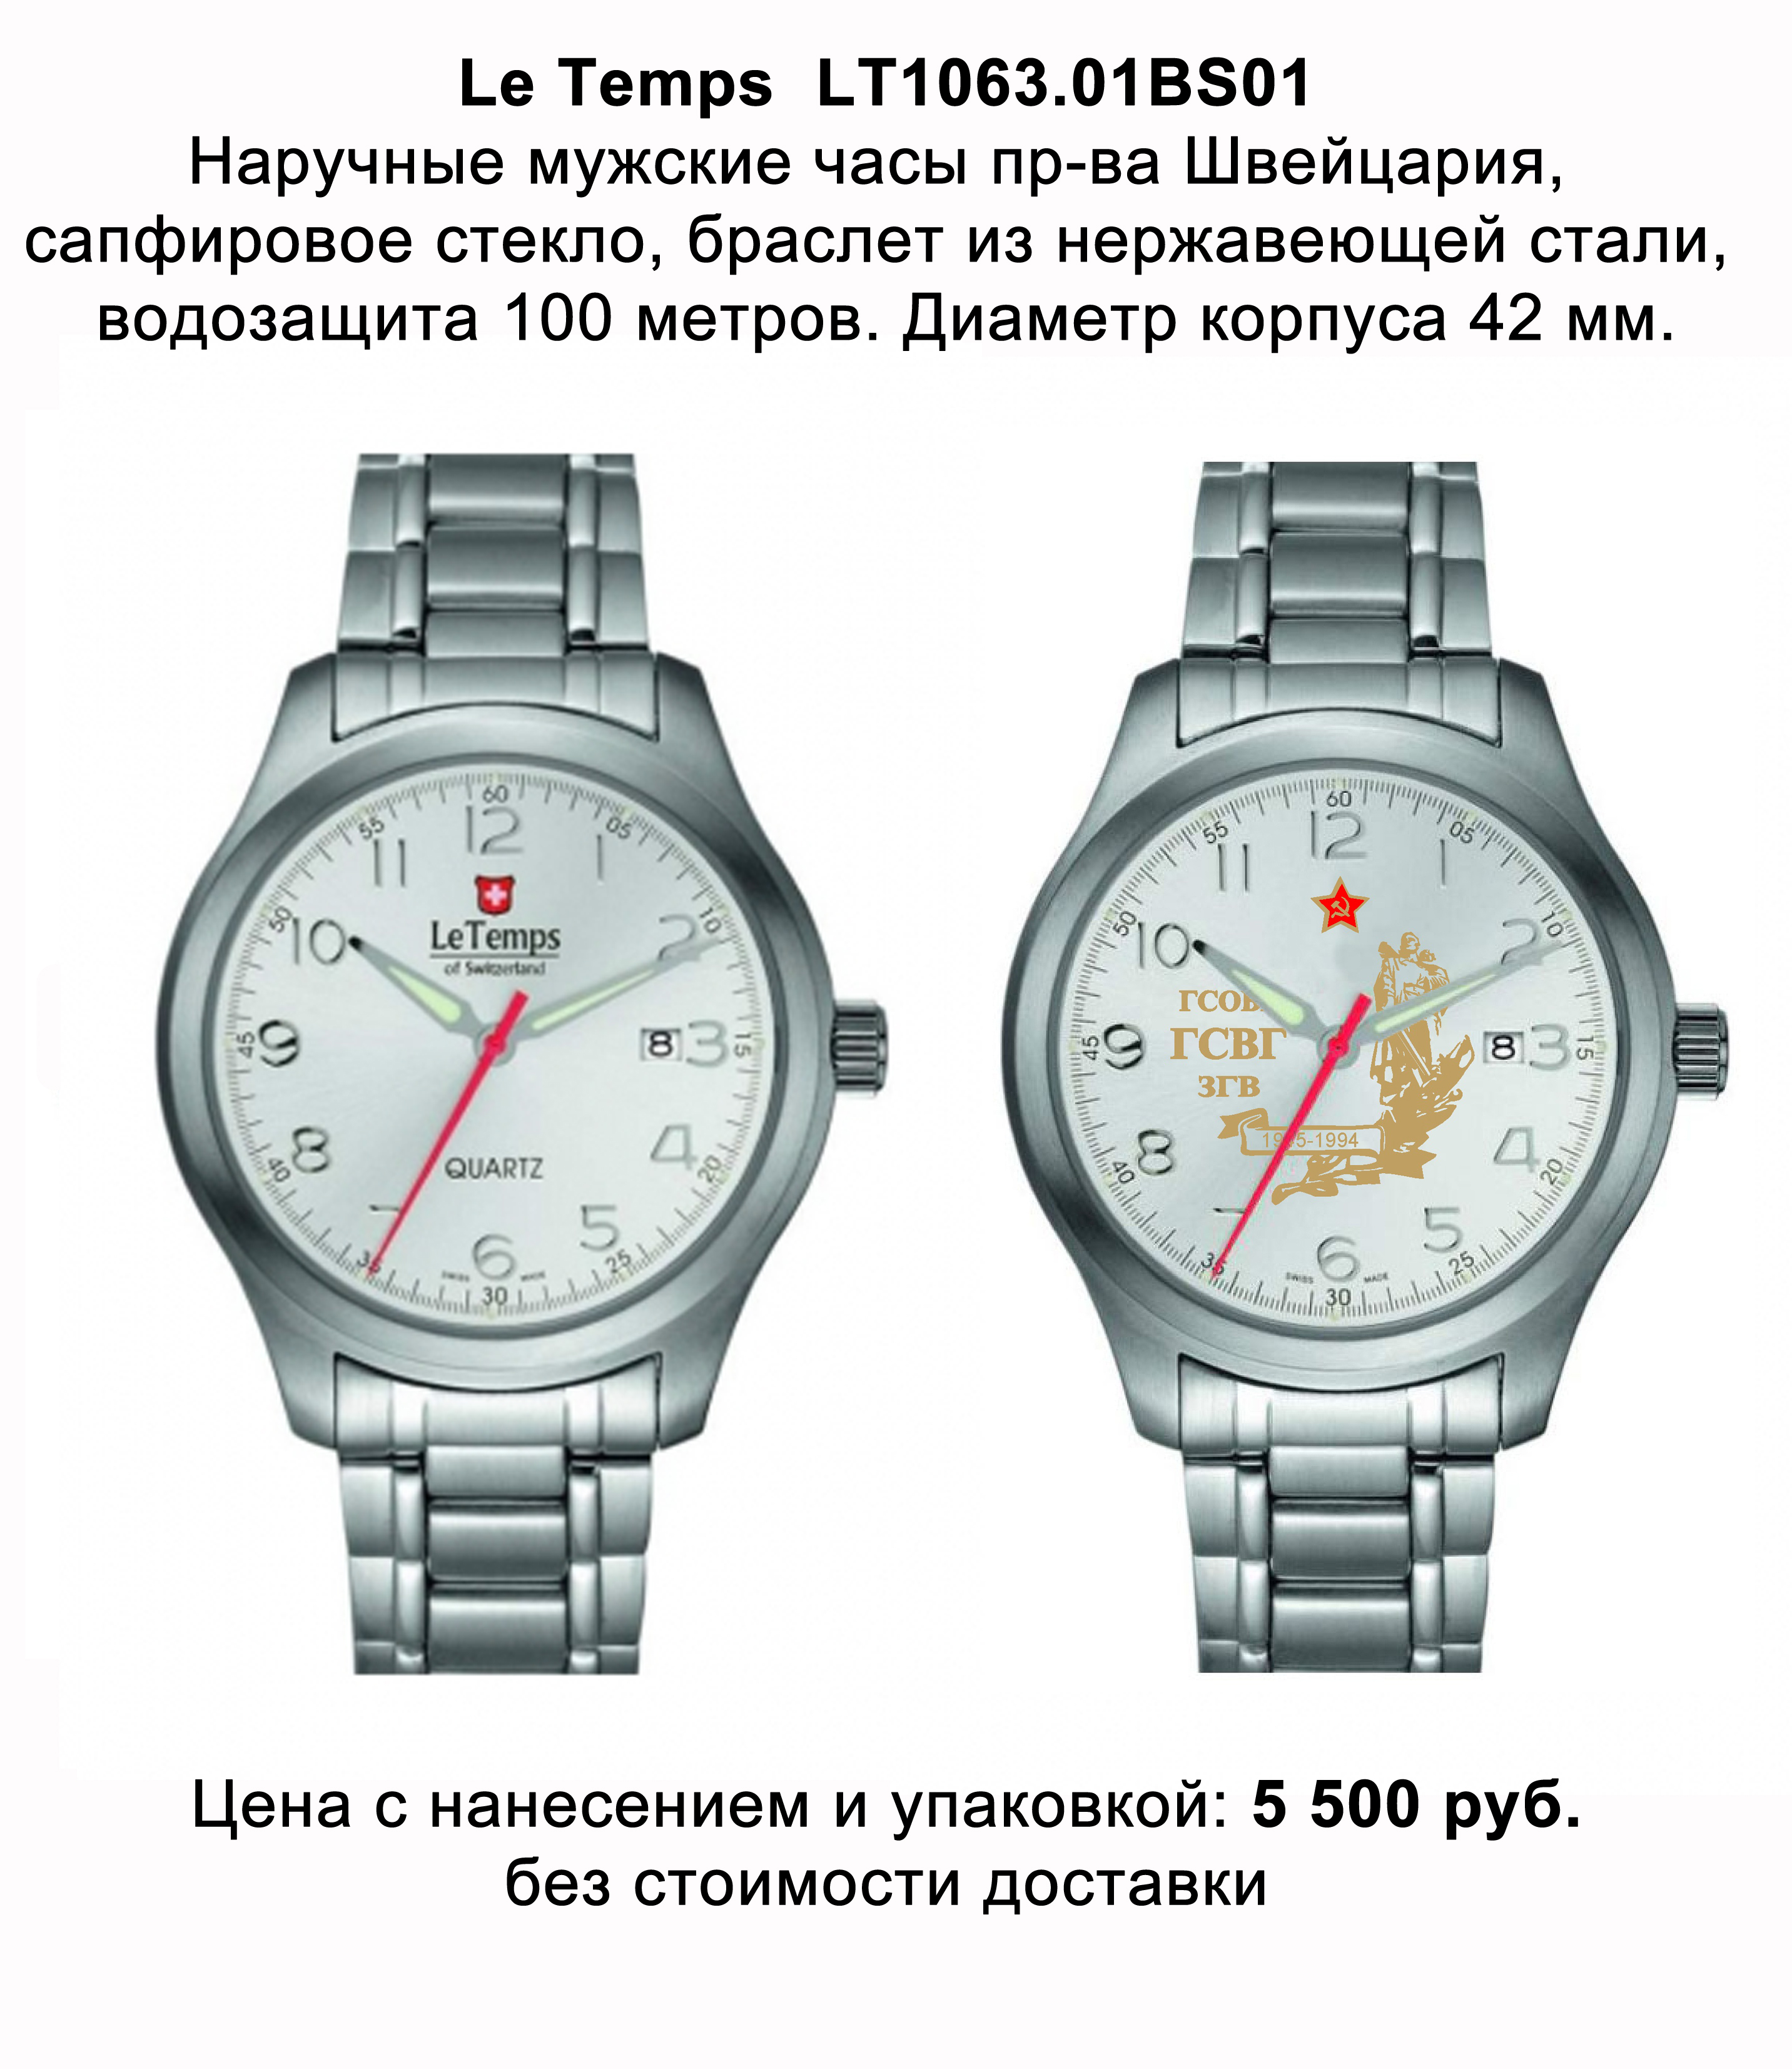 http://s2.uploads.ru/hZN70.jpg